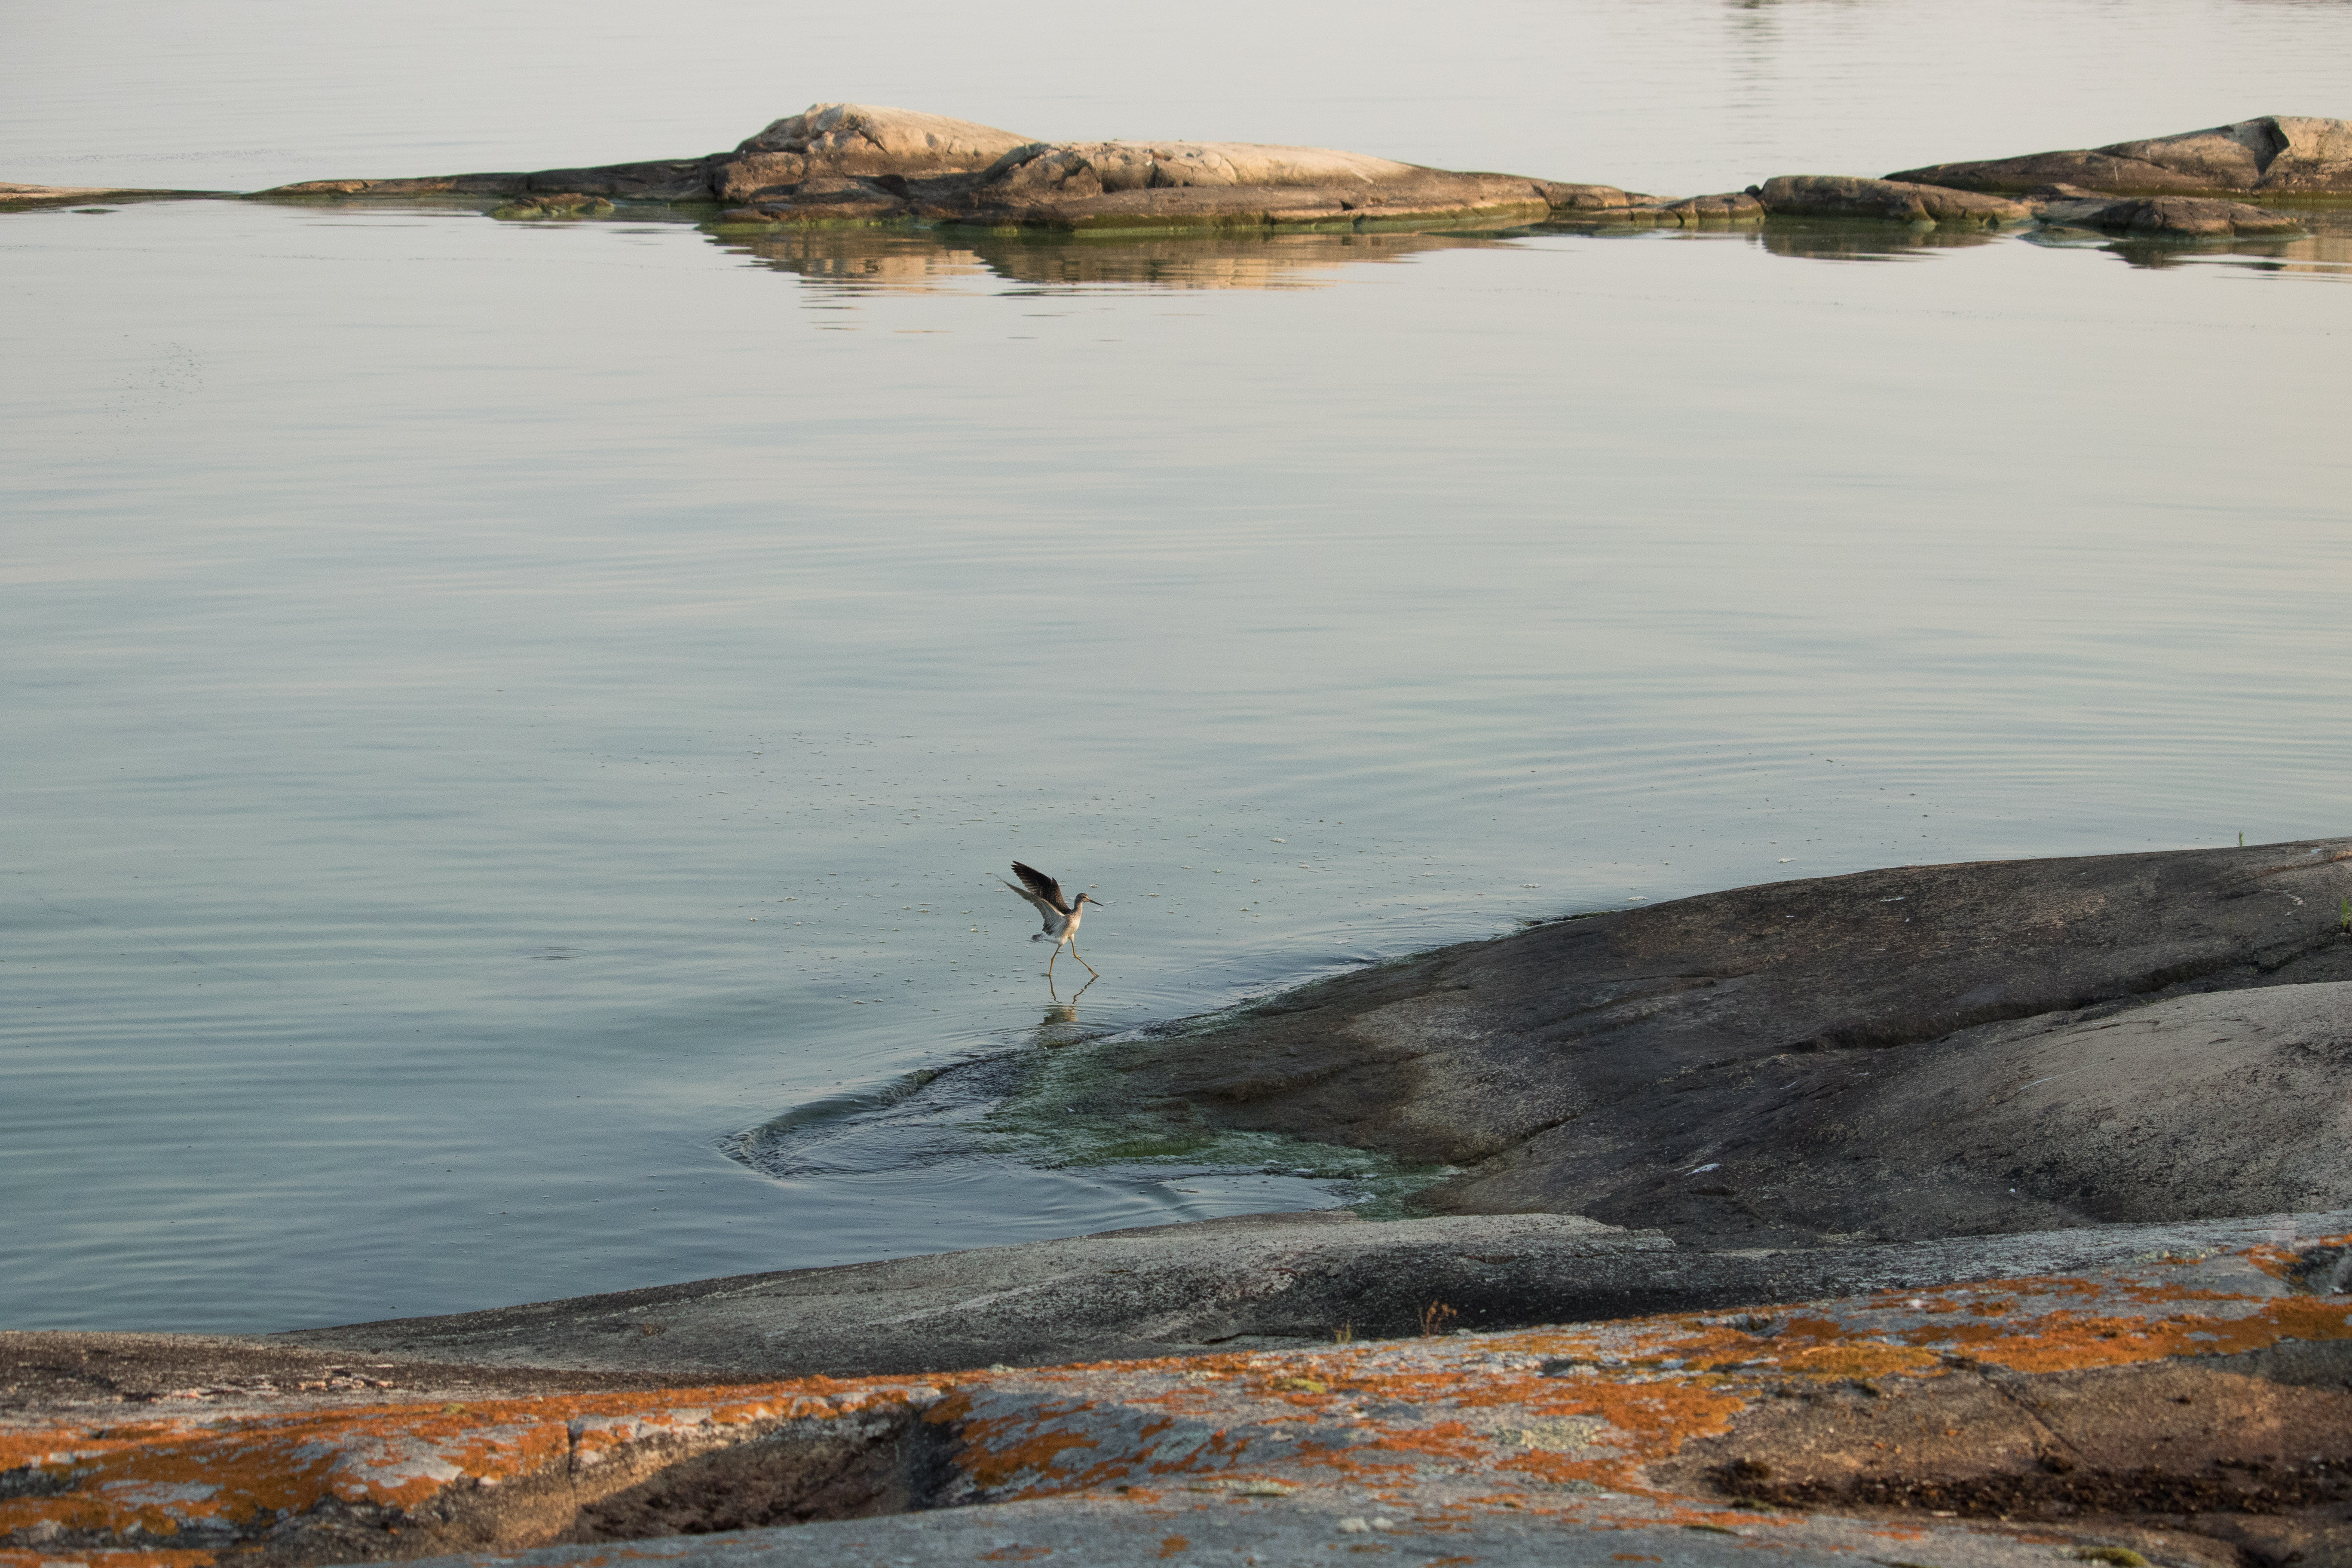 Lake Winnipeg Circumnavigation Campaign